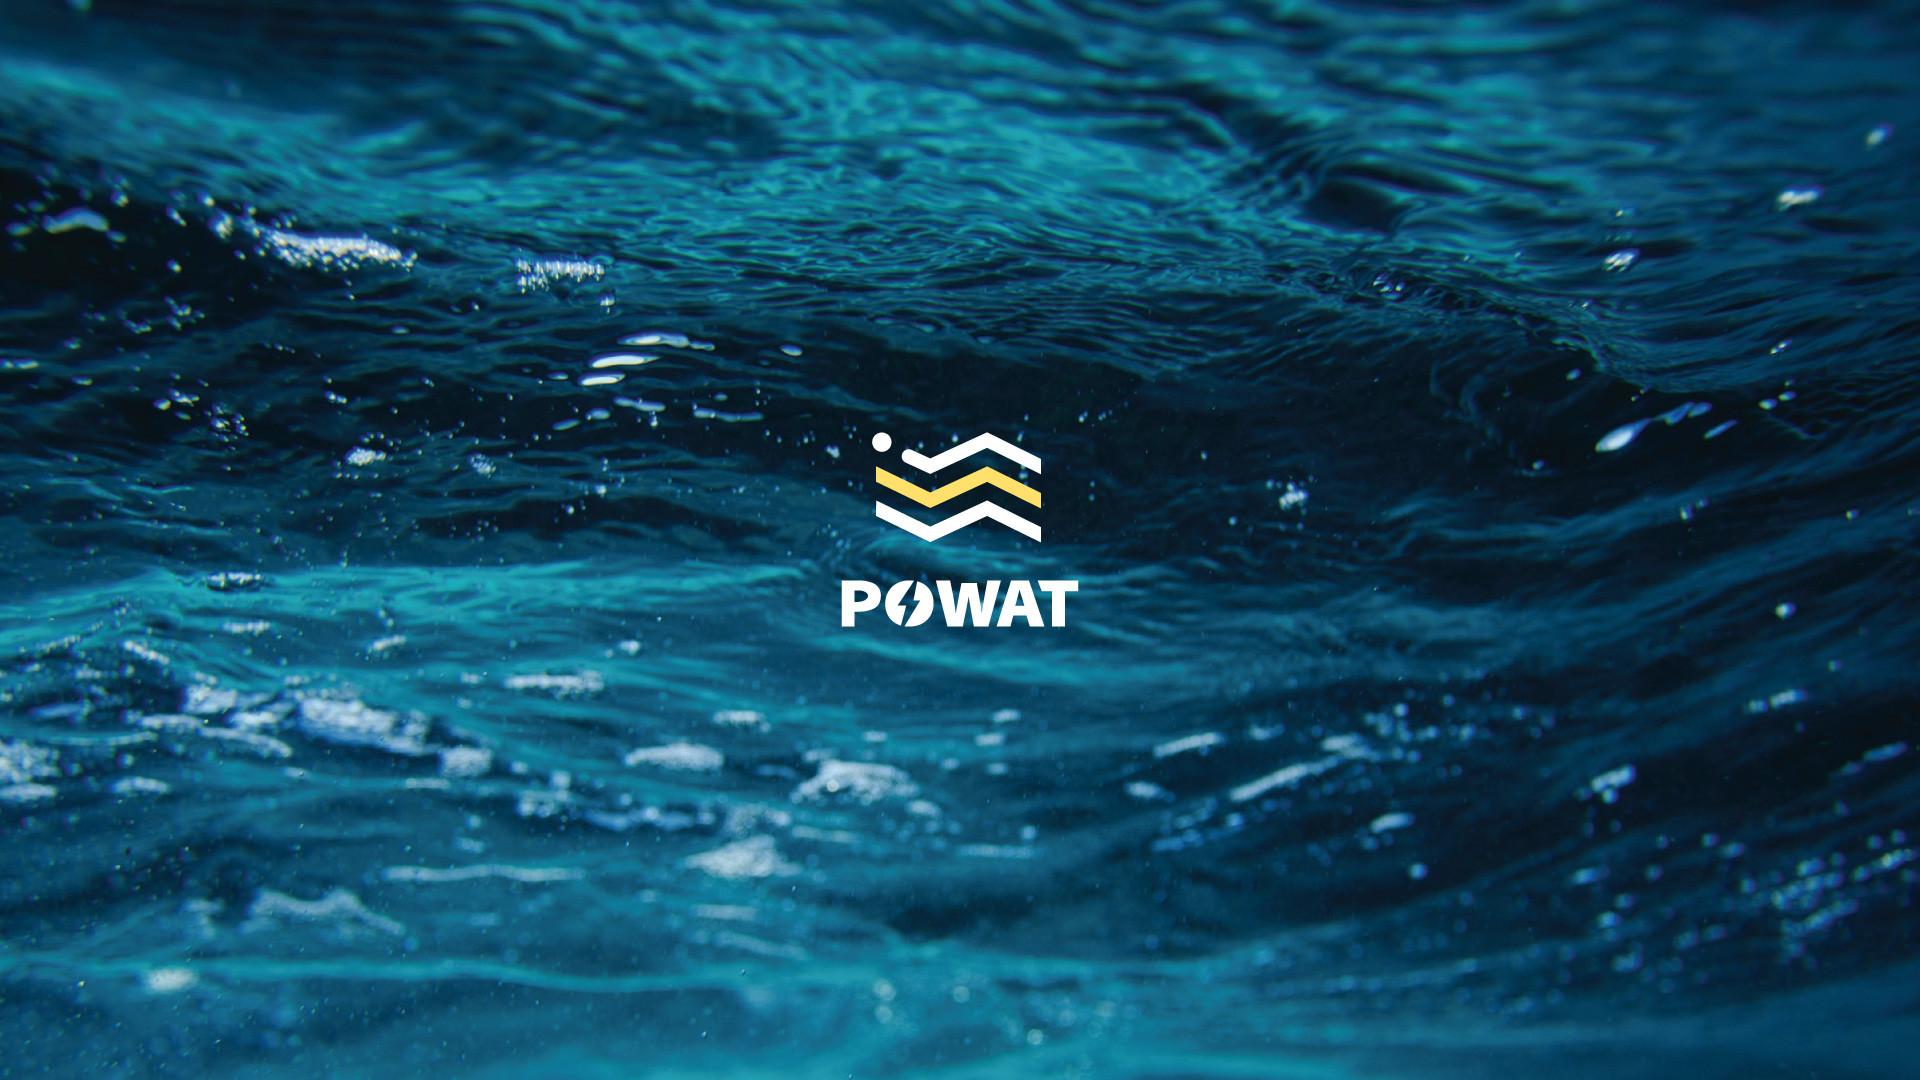 POWAT-06.jpg